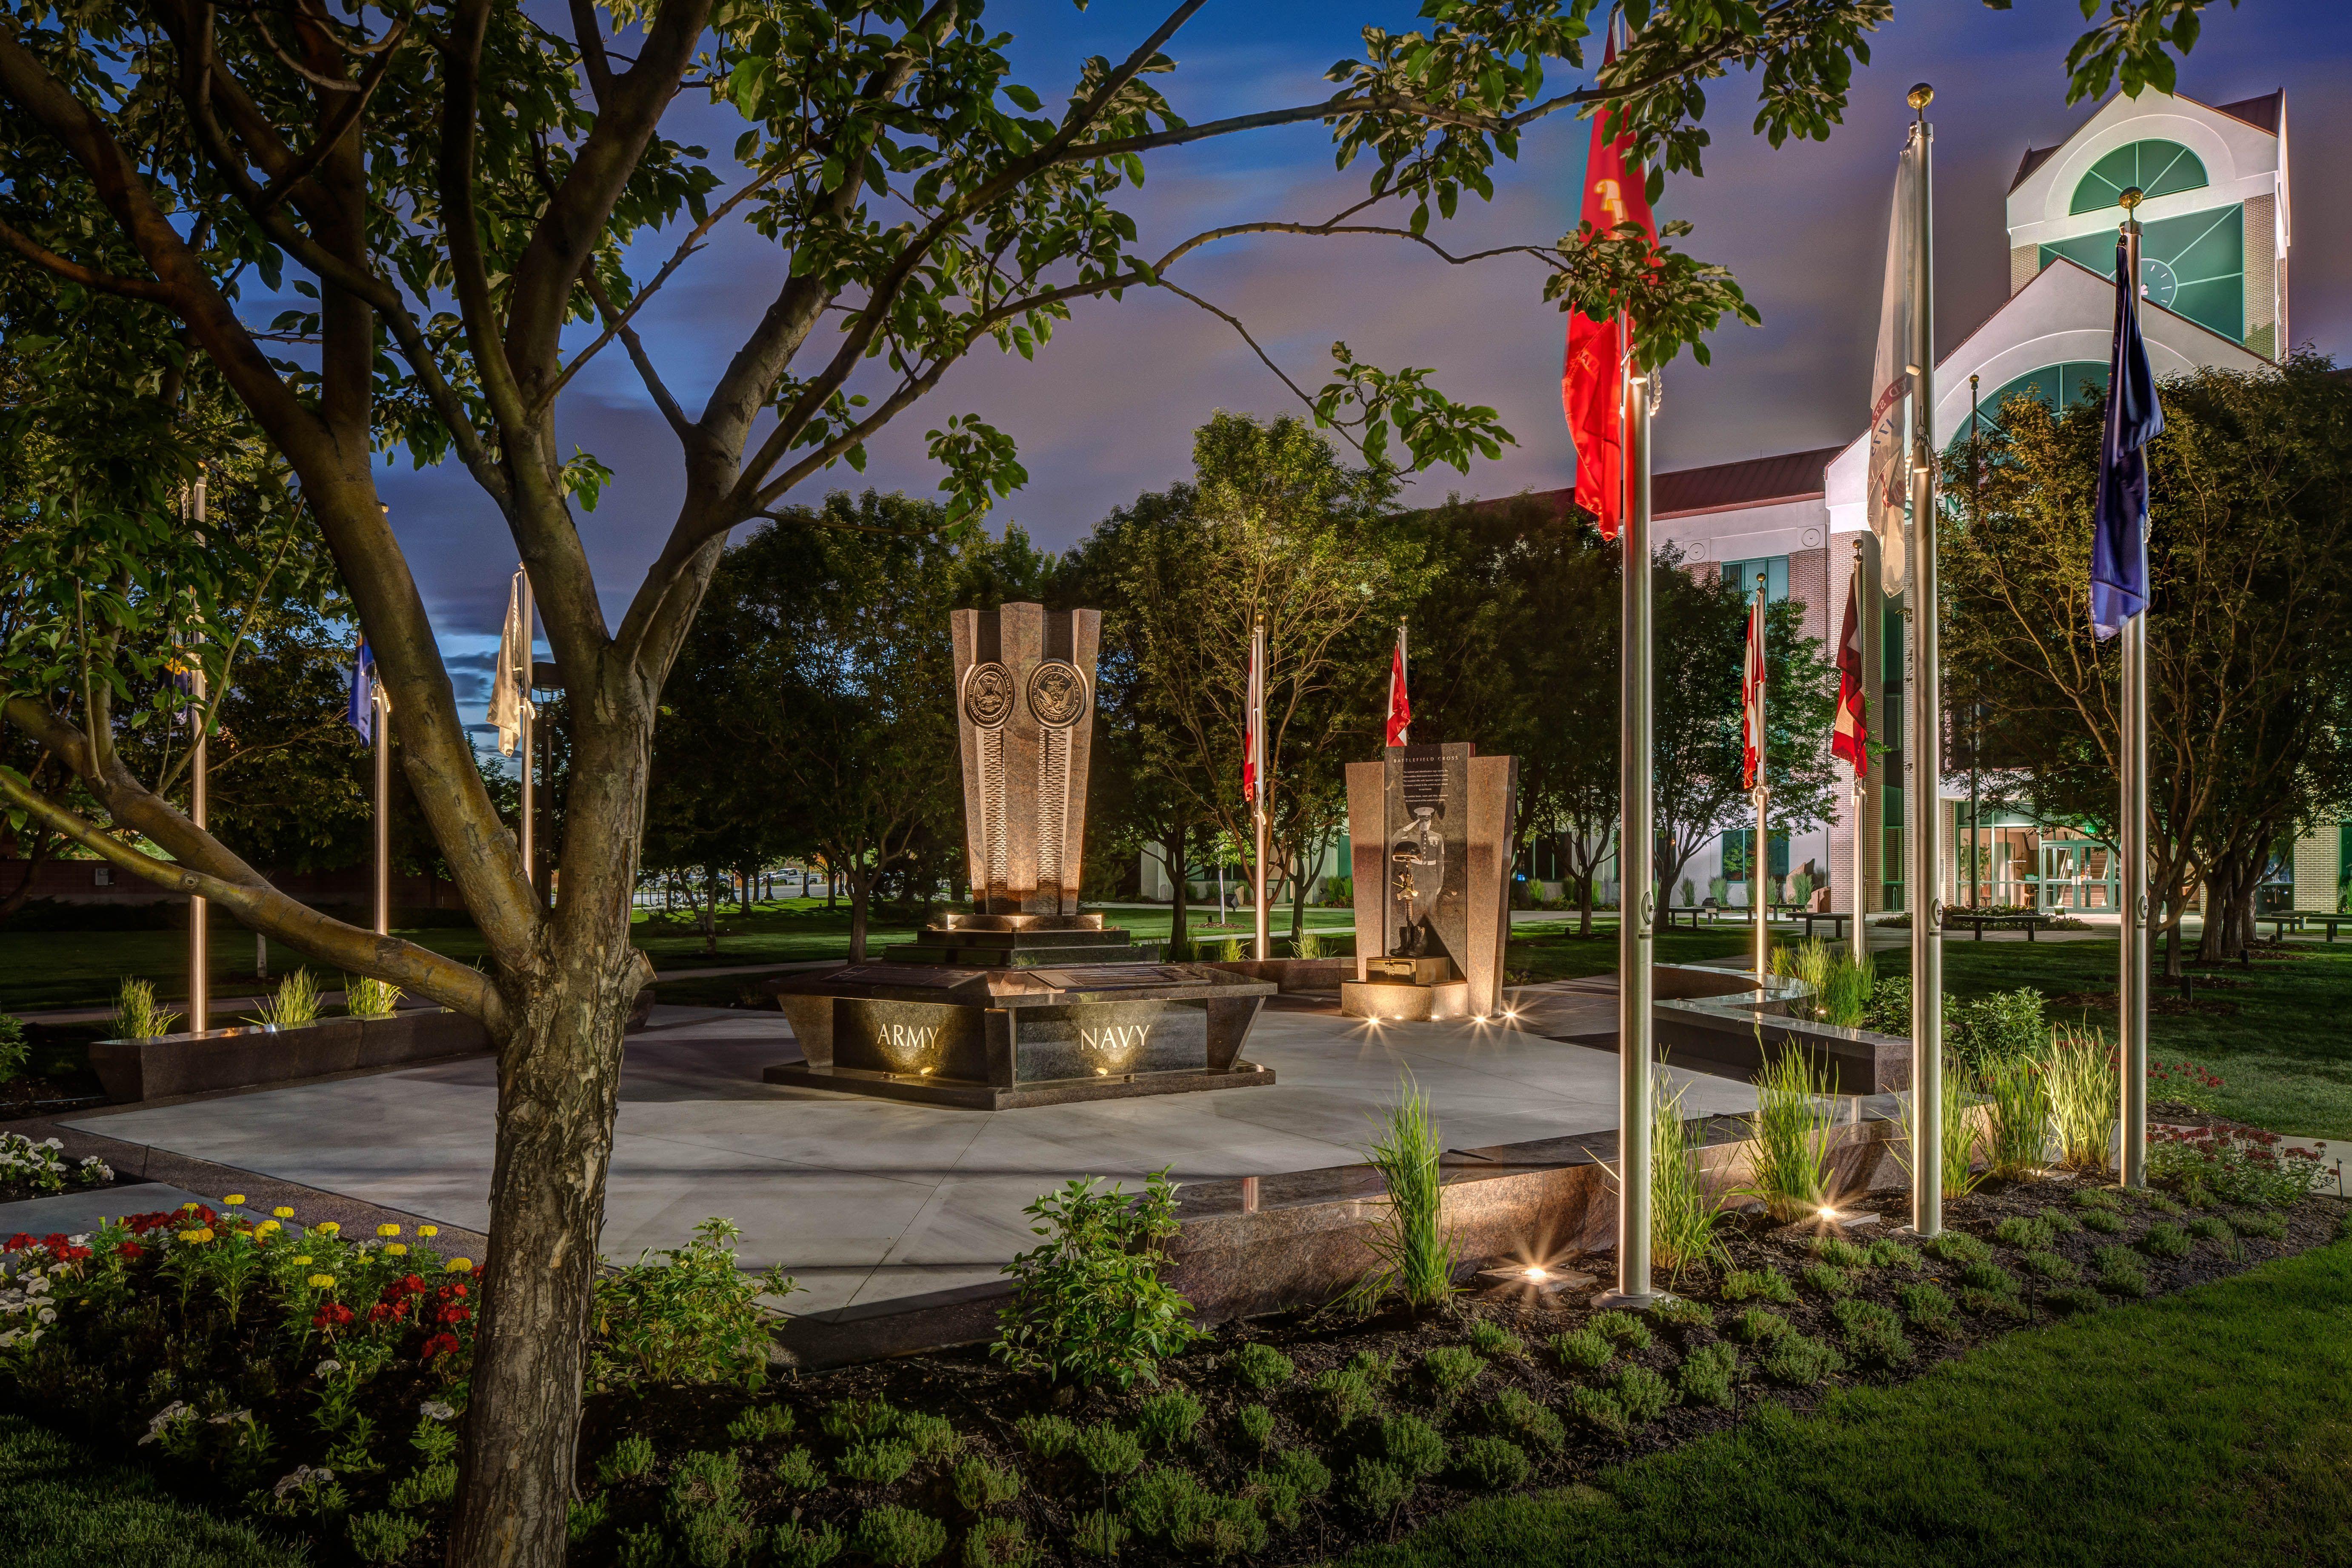 Landscape Lighting Pro of Utah is honored to provide the landscape lighting for the Utah Freedom Memorial. & Utah Freedom Memorial | Commercial Lighting Properties | Pinterest ... azcodes.com